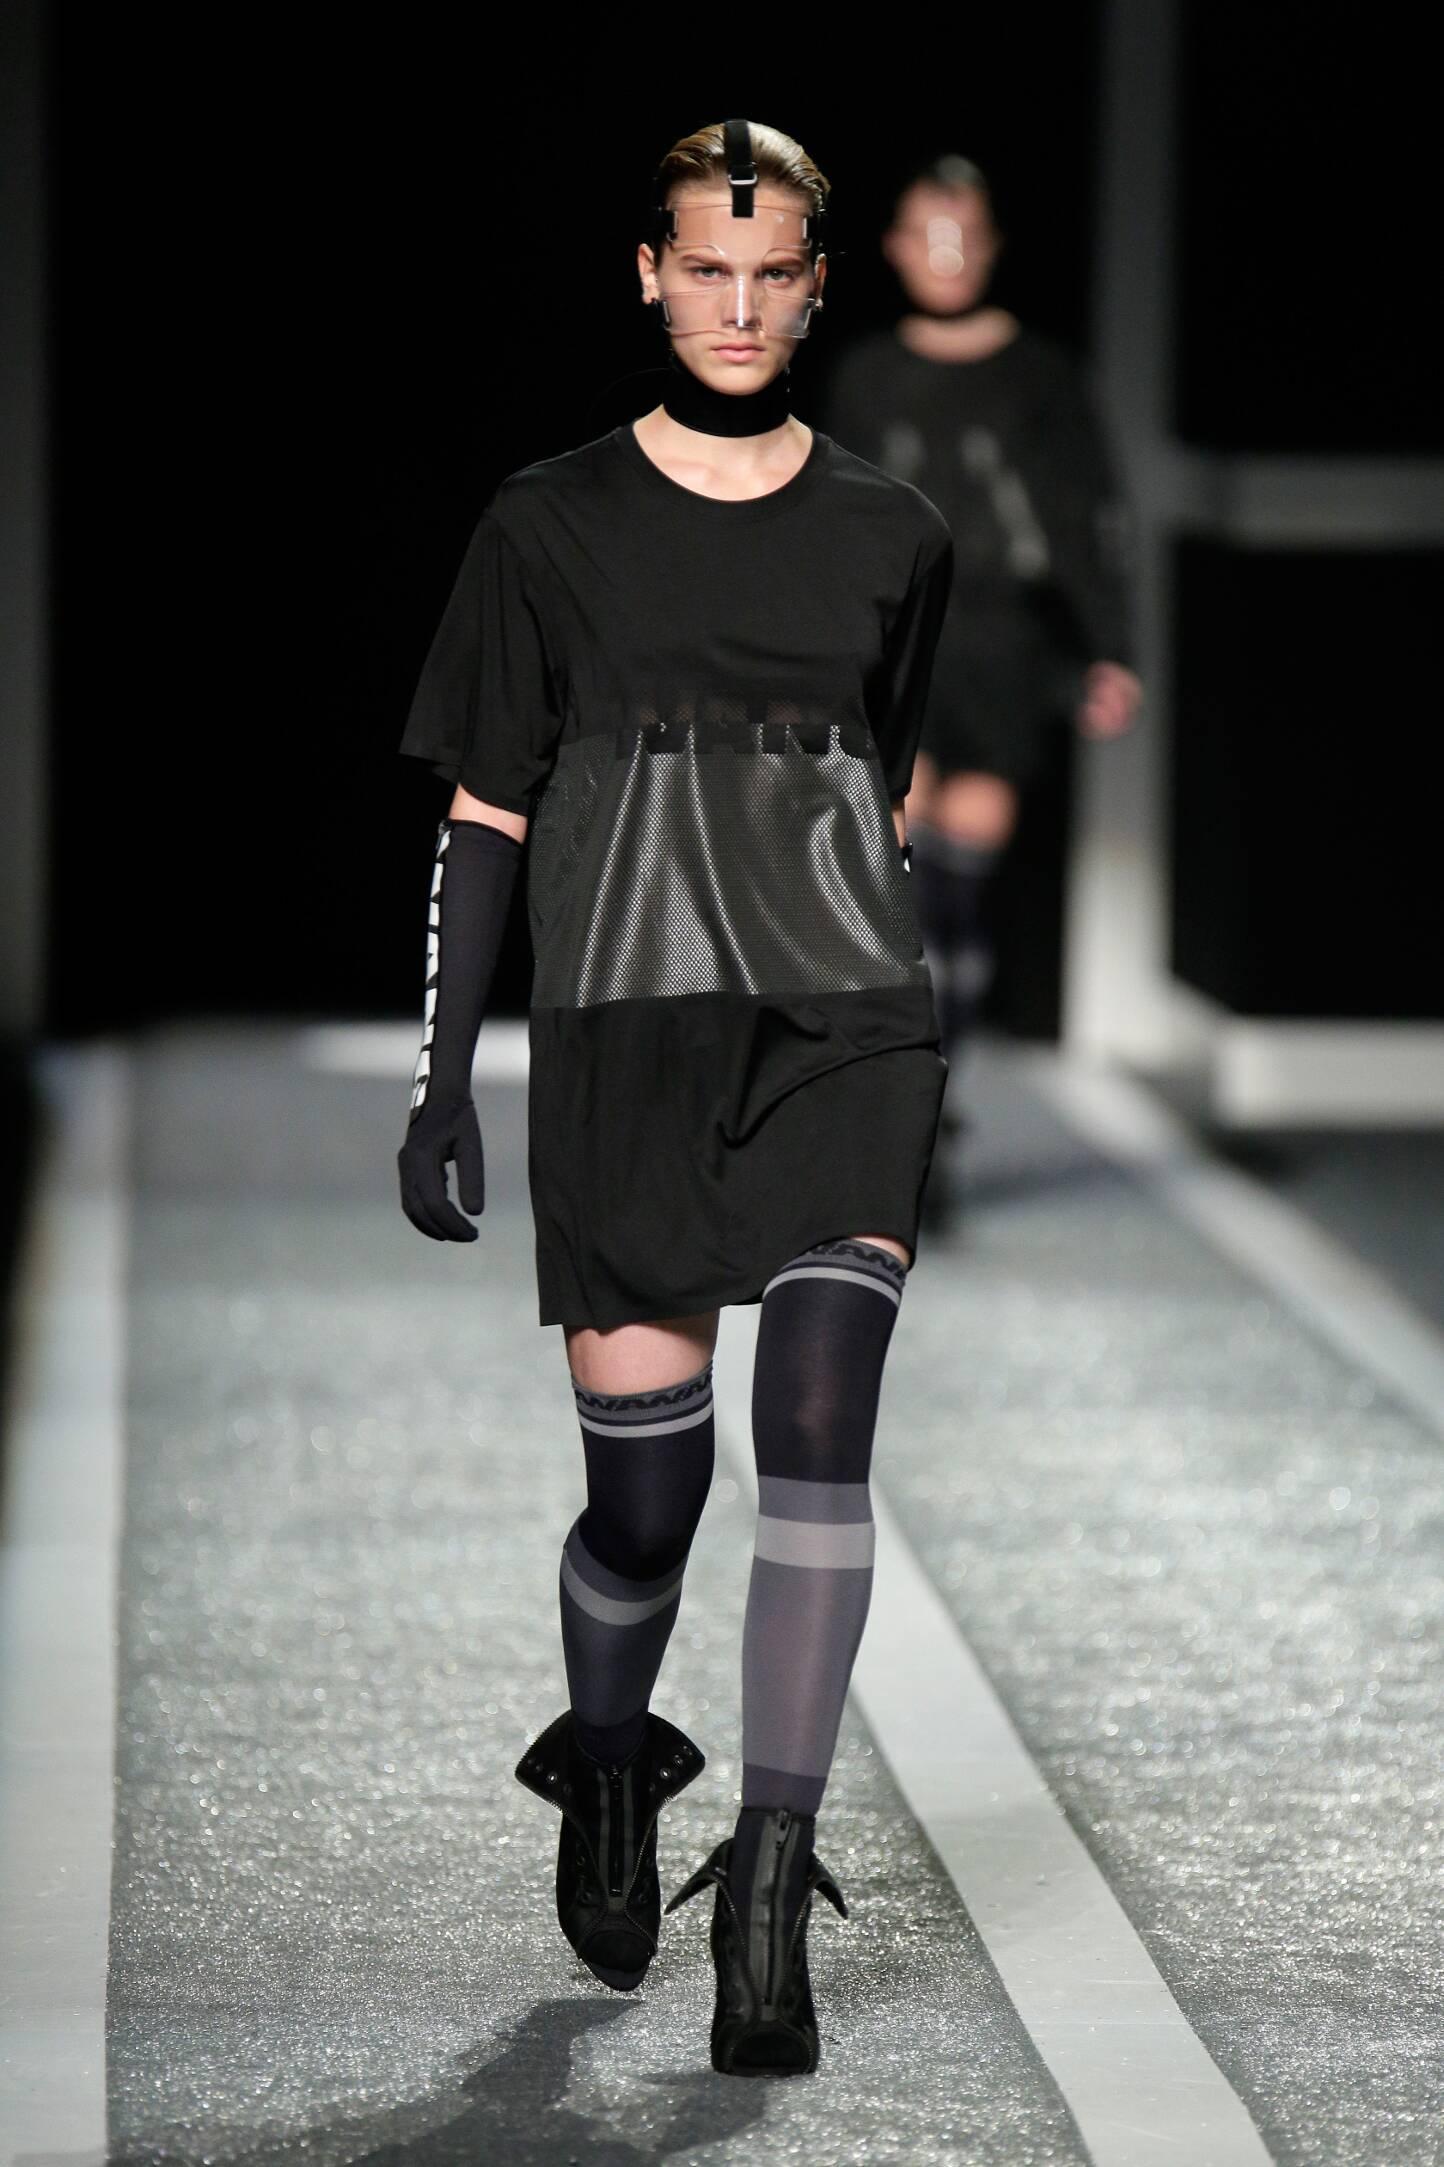 Alexander Wang for H&M 2015 Womenswear